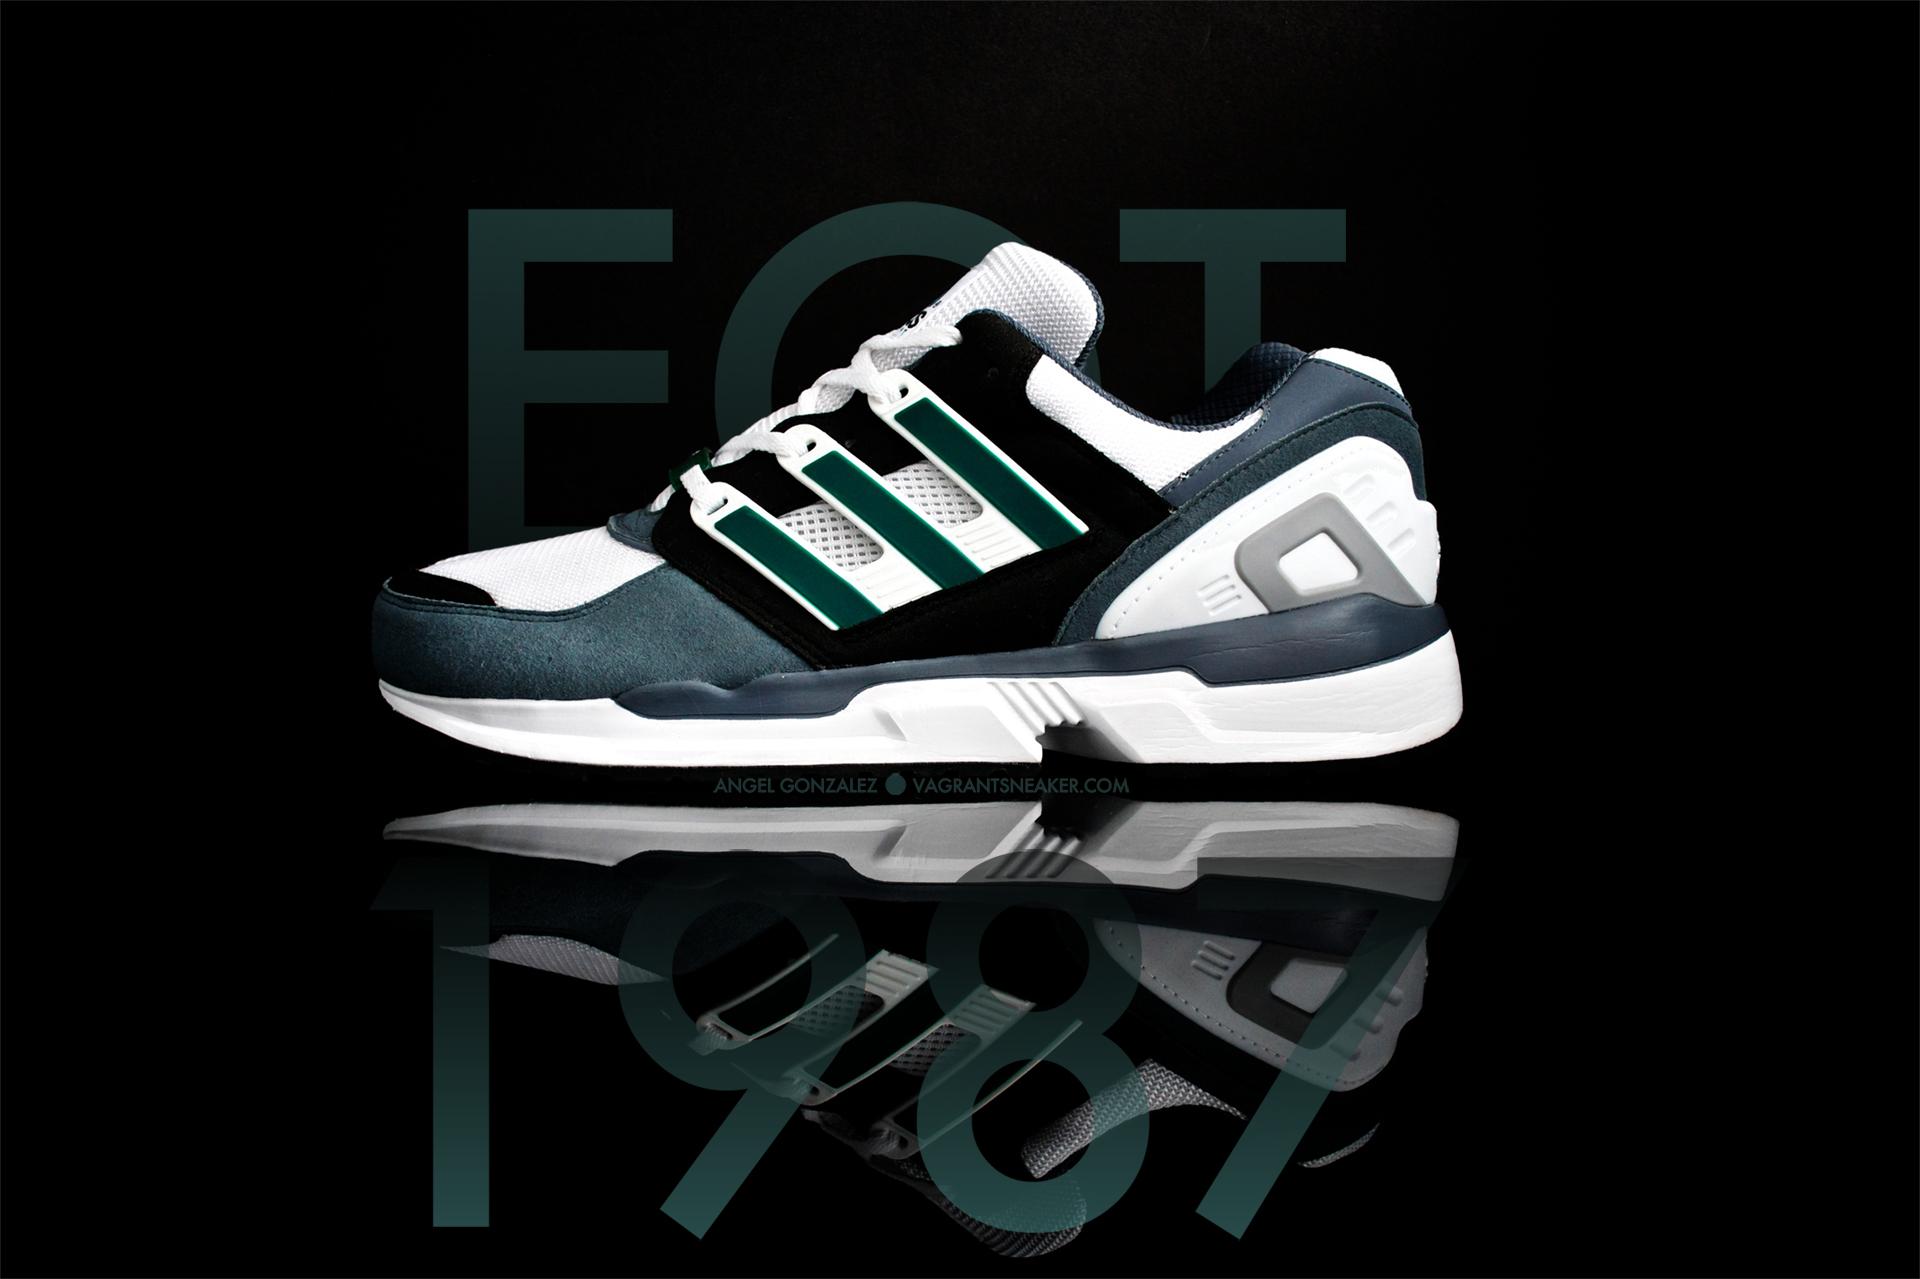 Adidas Eqt Support Og Retro 2011